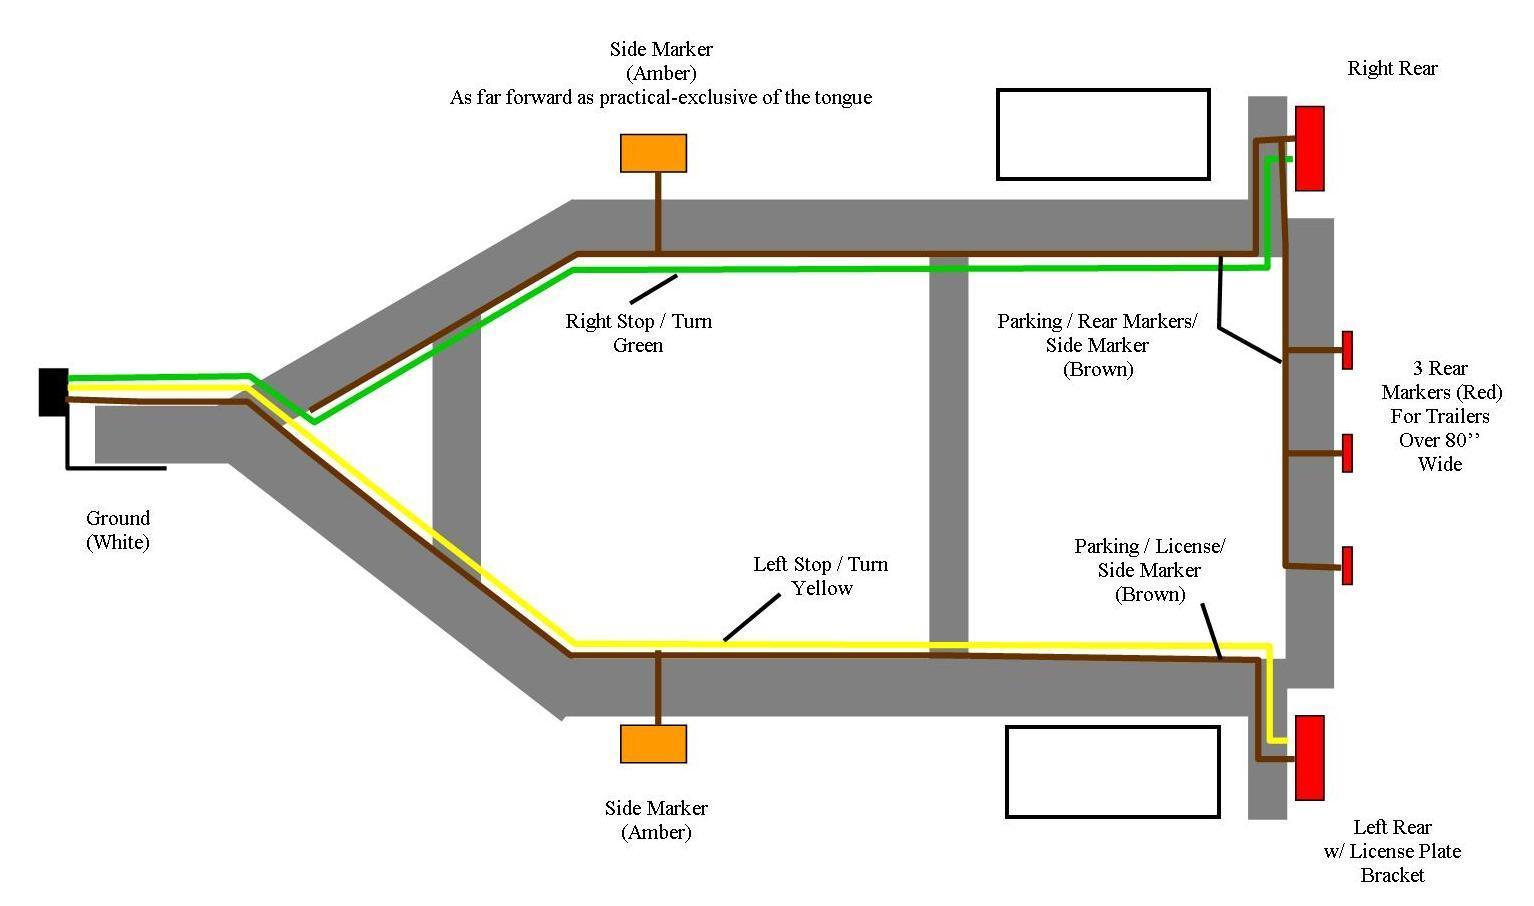 Snow Bear Trailer Wiring Diagram Tail Light - 12 Volt Relay Wiring Diagrams  Durite Vsr Split Charge Relays 12v - dumble.yenpancane.jeanjaures37.fr | Bear Trailer Wiring Diagram |  | Wiring Diagram Resource